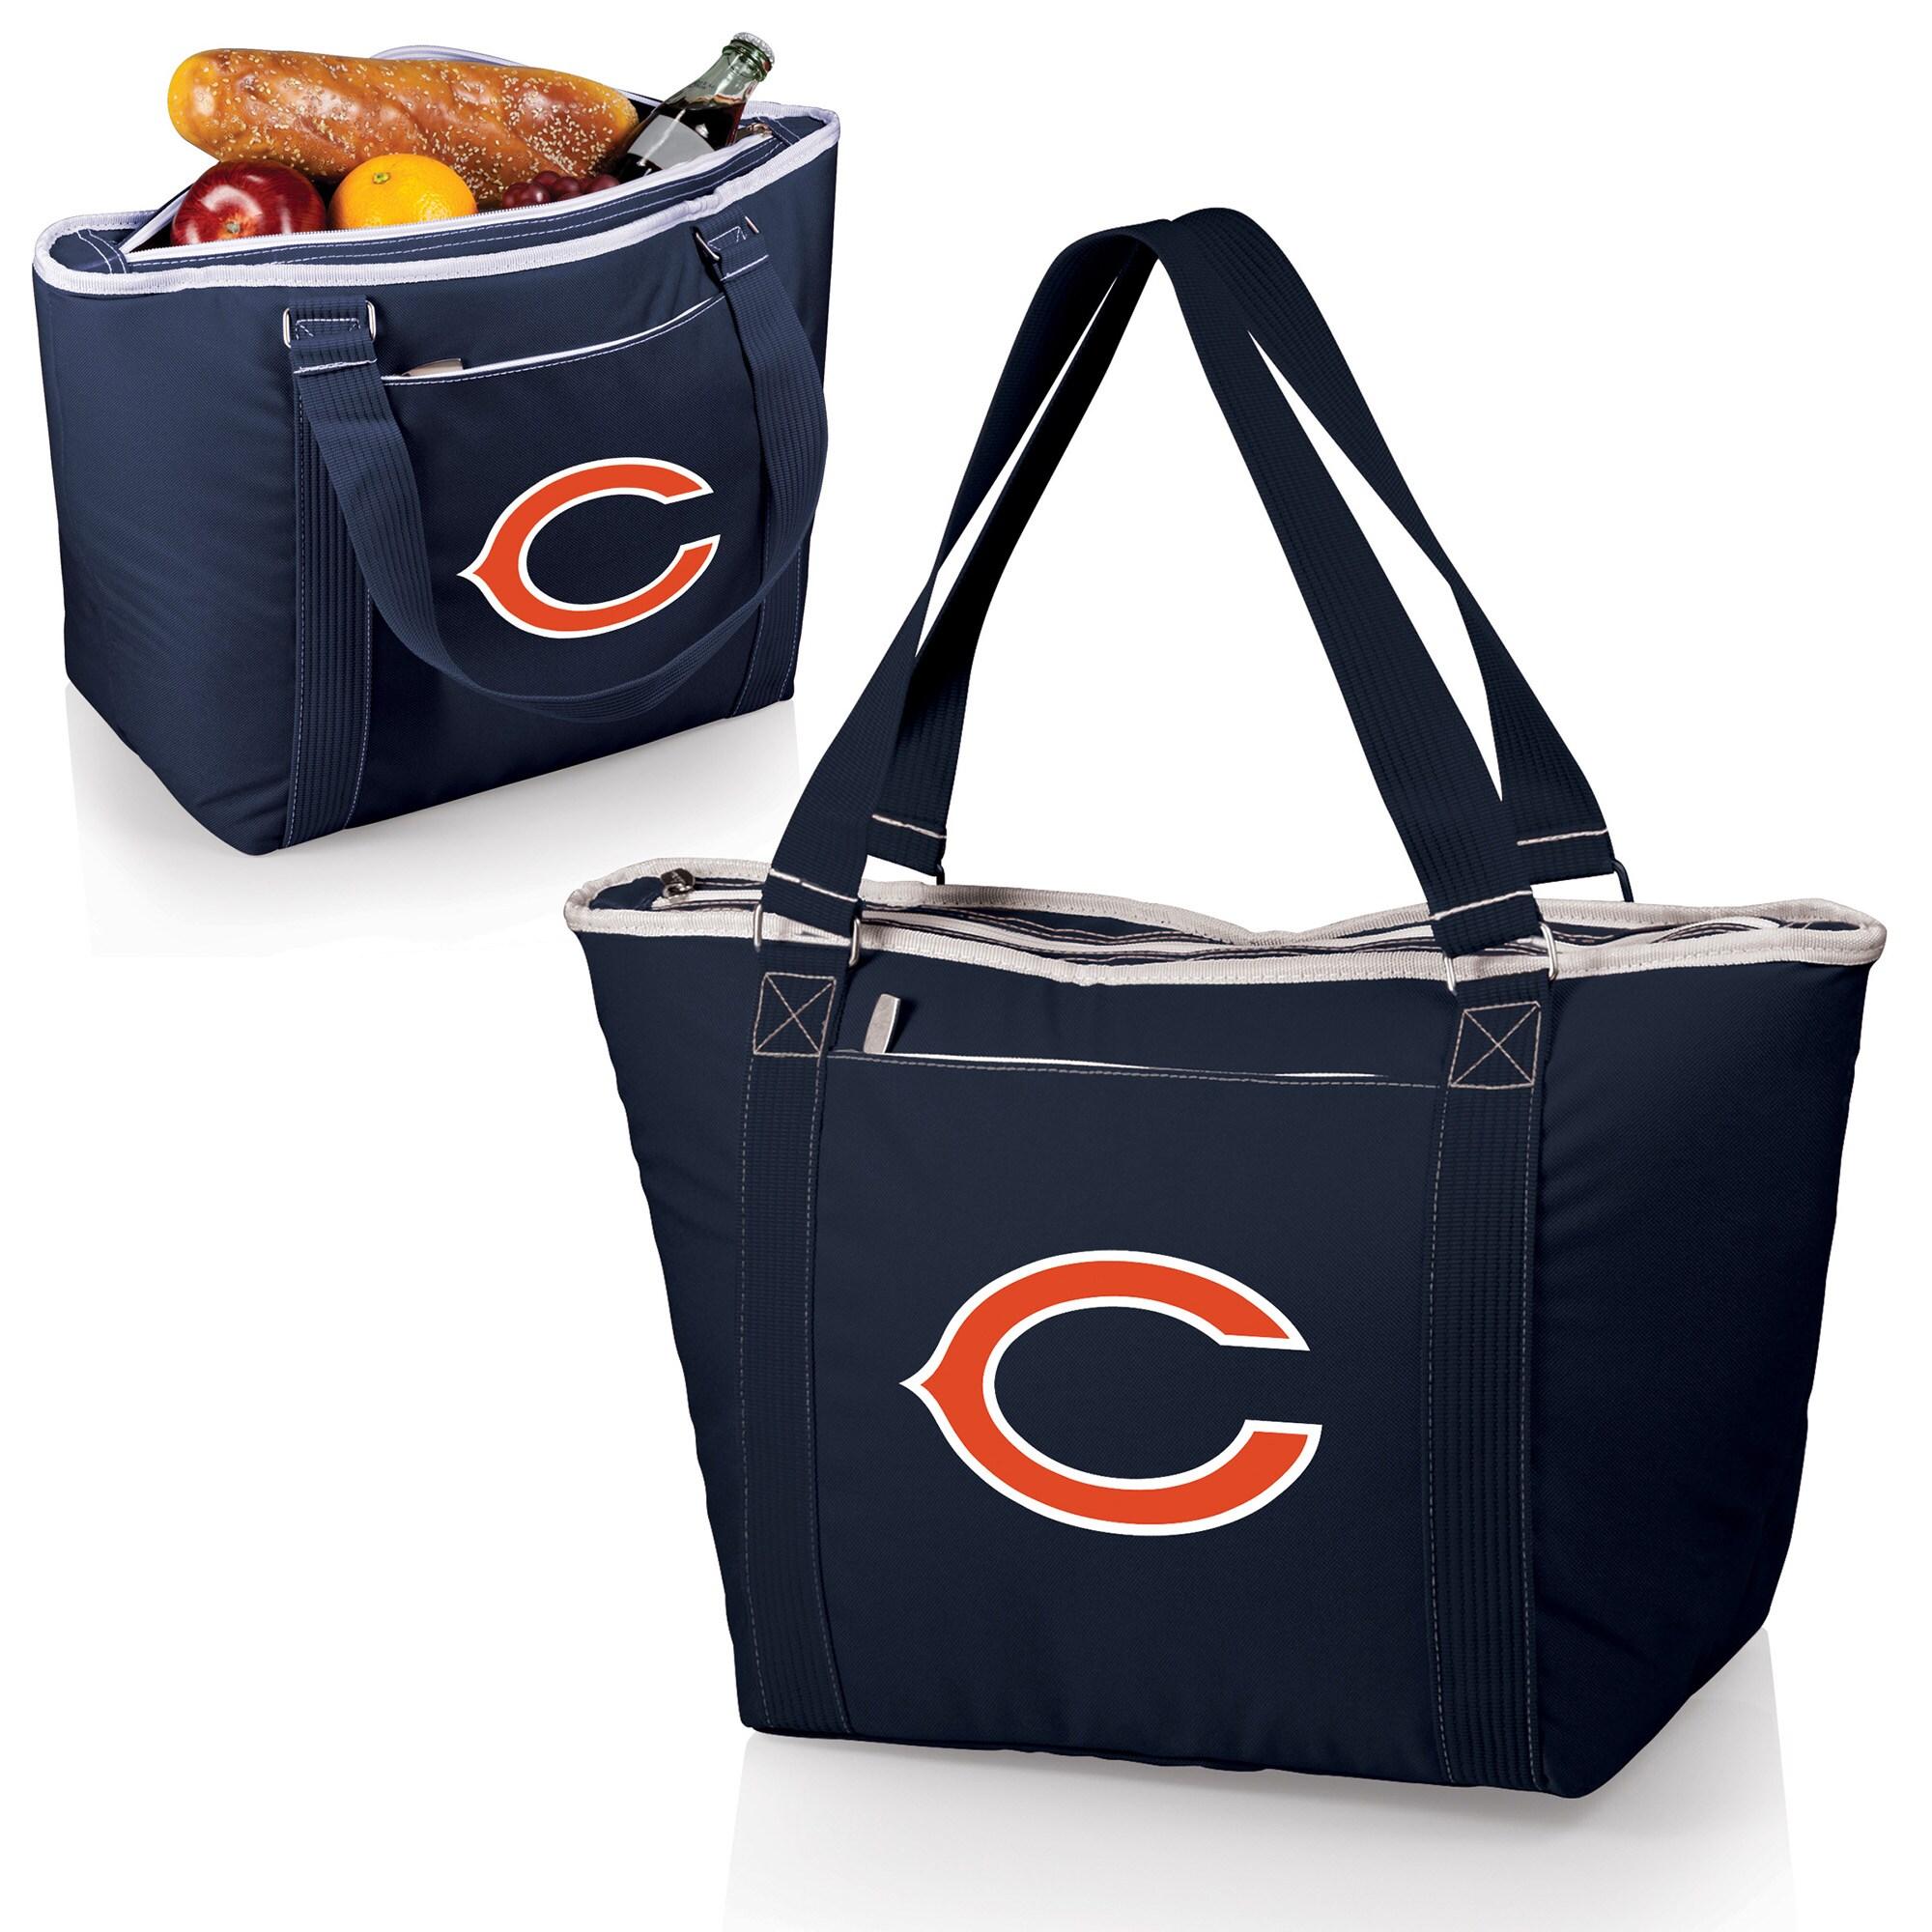 Chicago Bears Topanga Cooler Tote - Navy